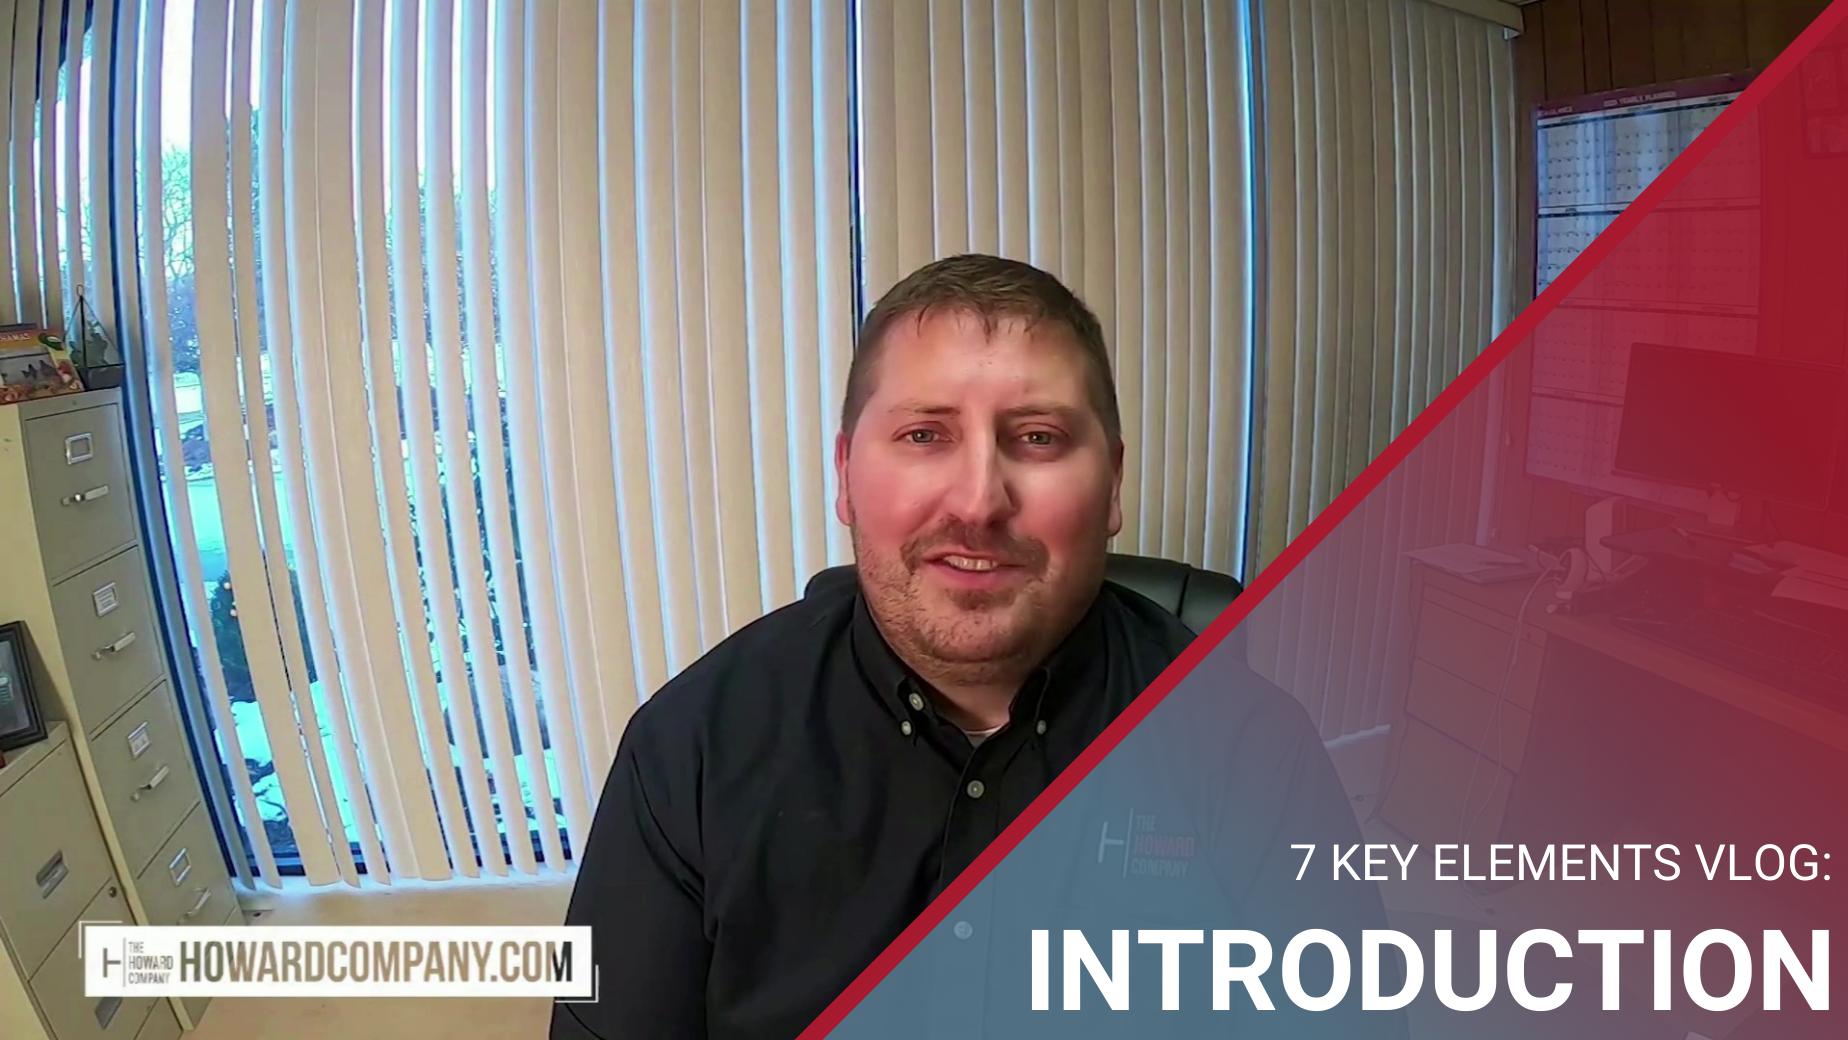 Gary Digital Series Vlog Intro